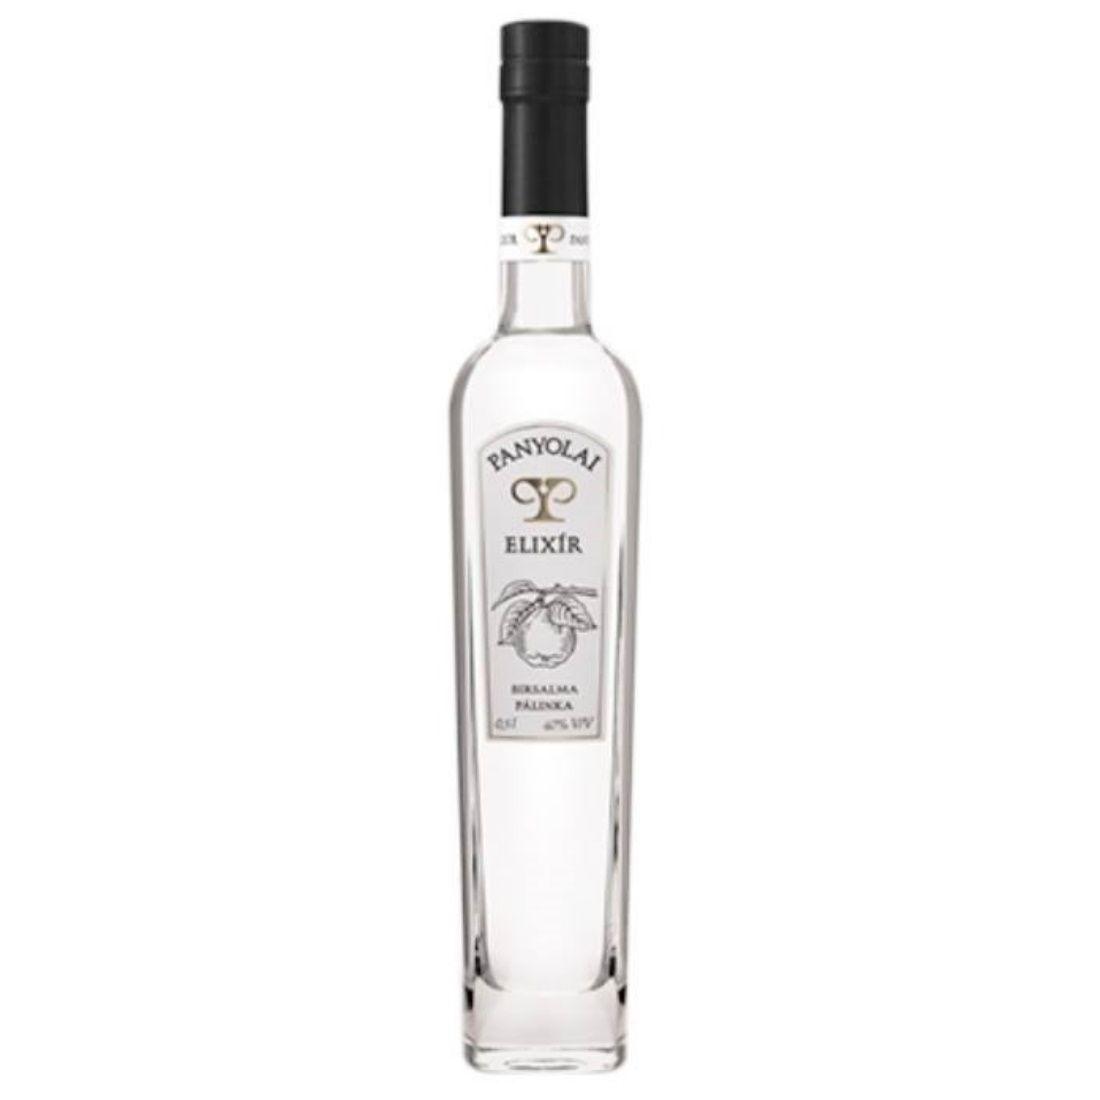 Panyolai Elixir Birsalma 0,5l 40%